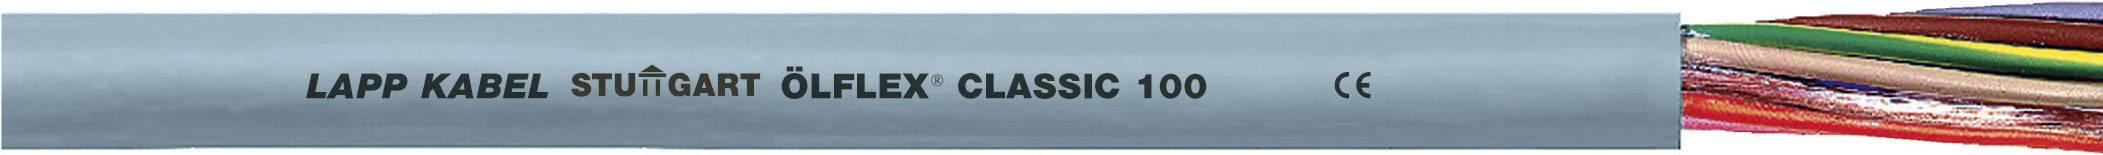 Kabel LappKabel Ölflex CLASSIC 100 10G0,75 (0010029), PVC, 9,6 mm, 500 V, šedá, 1000 m